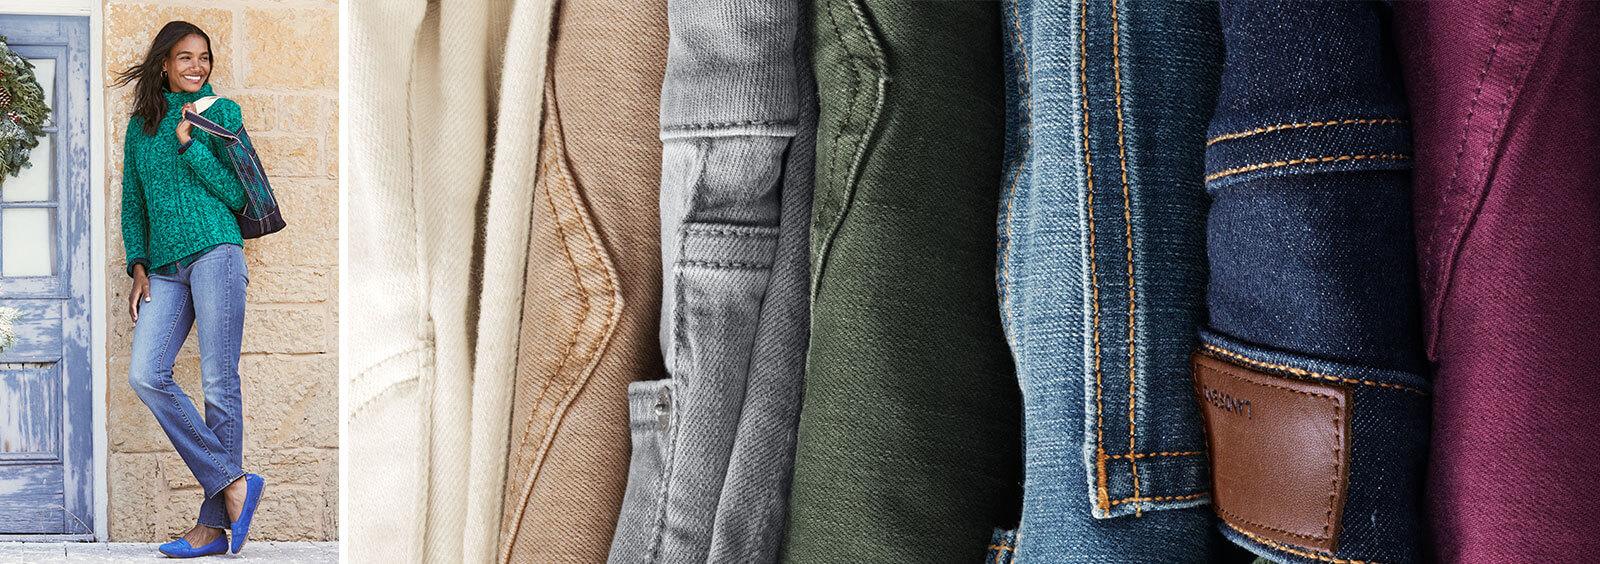 How to Make Jeans More Formal | Lands' End